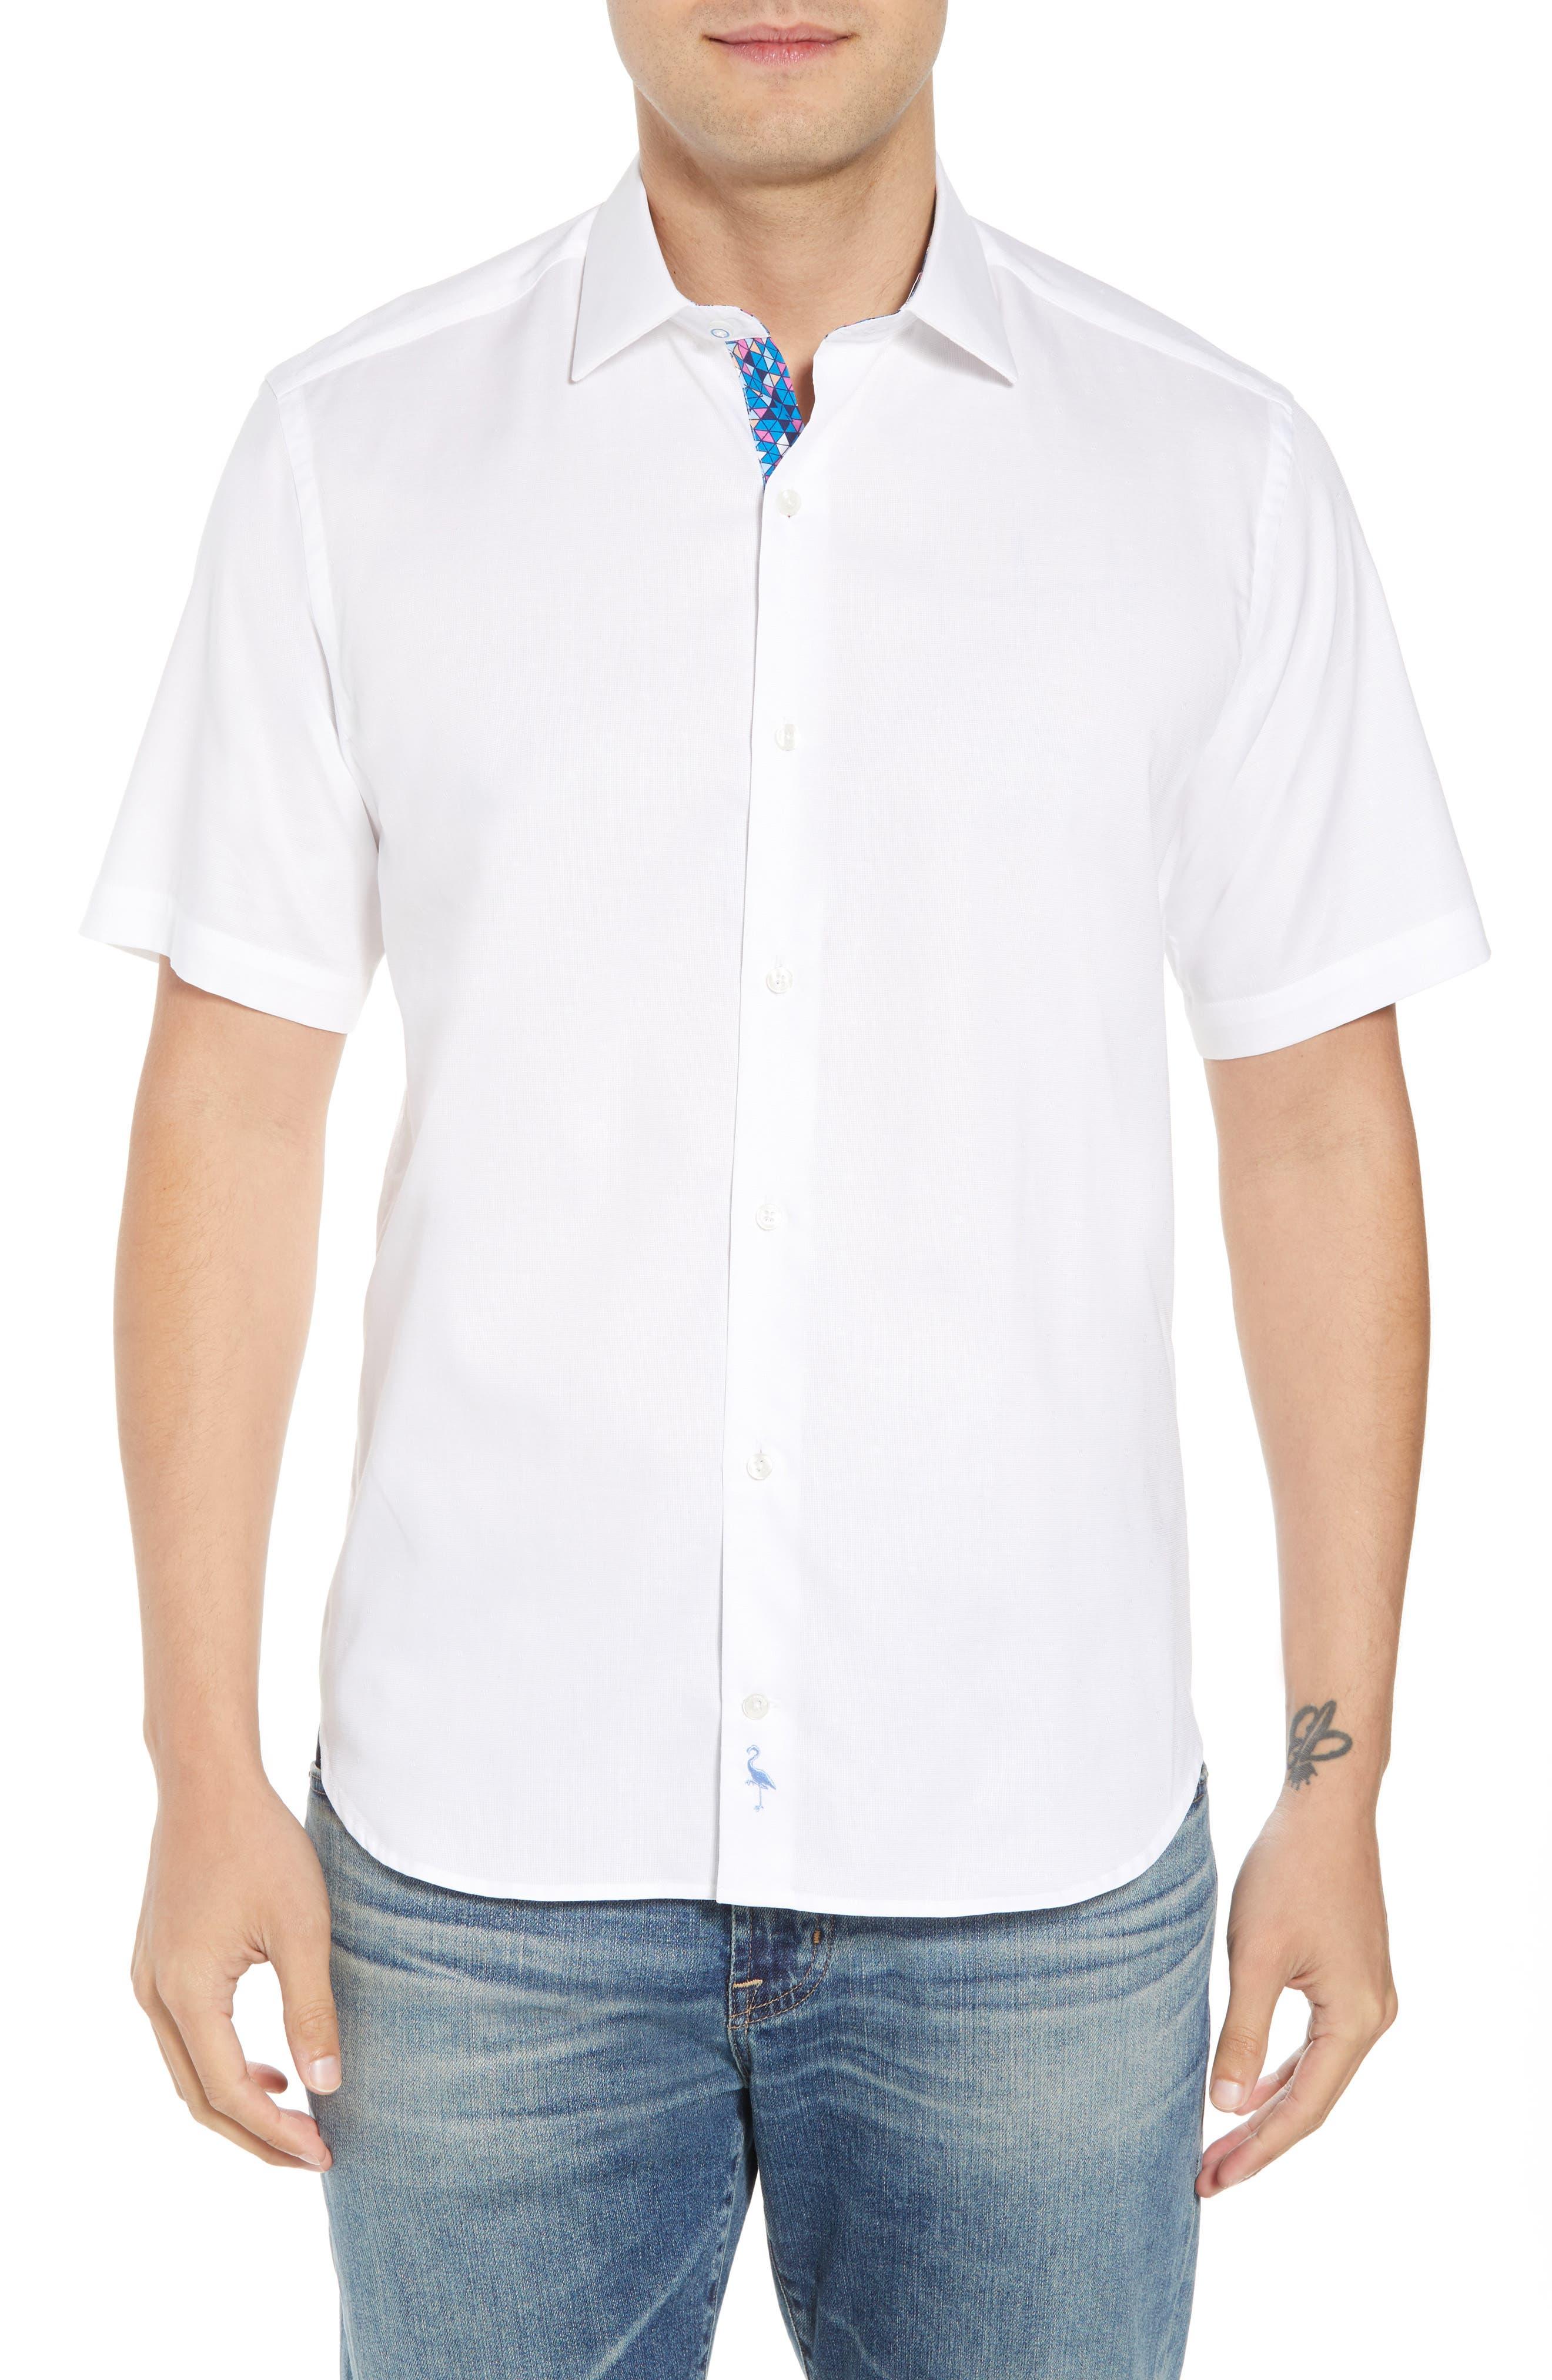 Arlen Regular Fit Sport Shirt,                             Main thumbnail 1, color,                             White